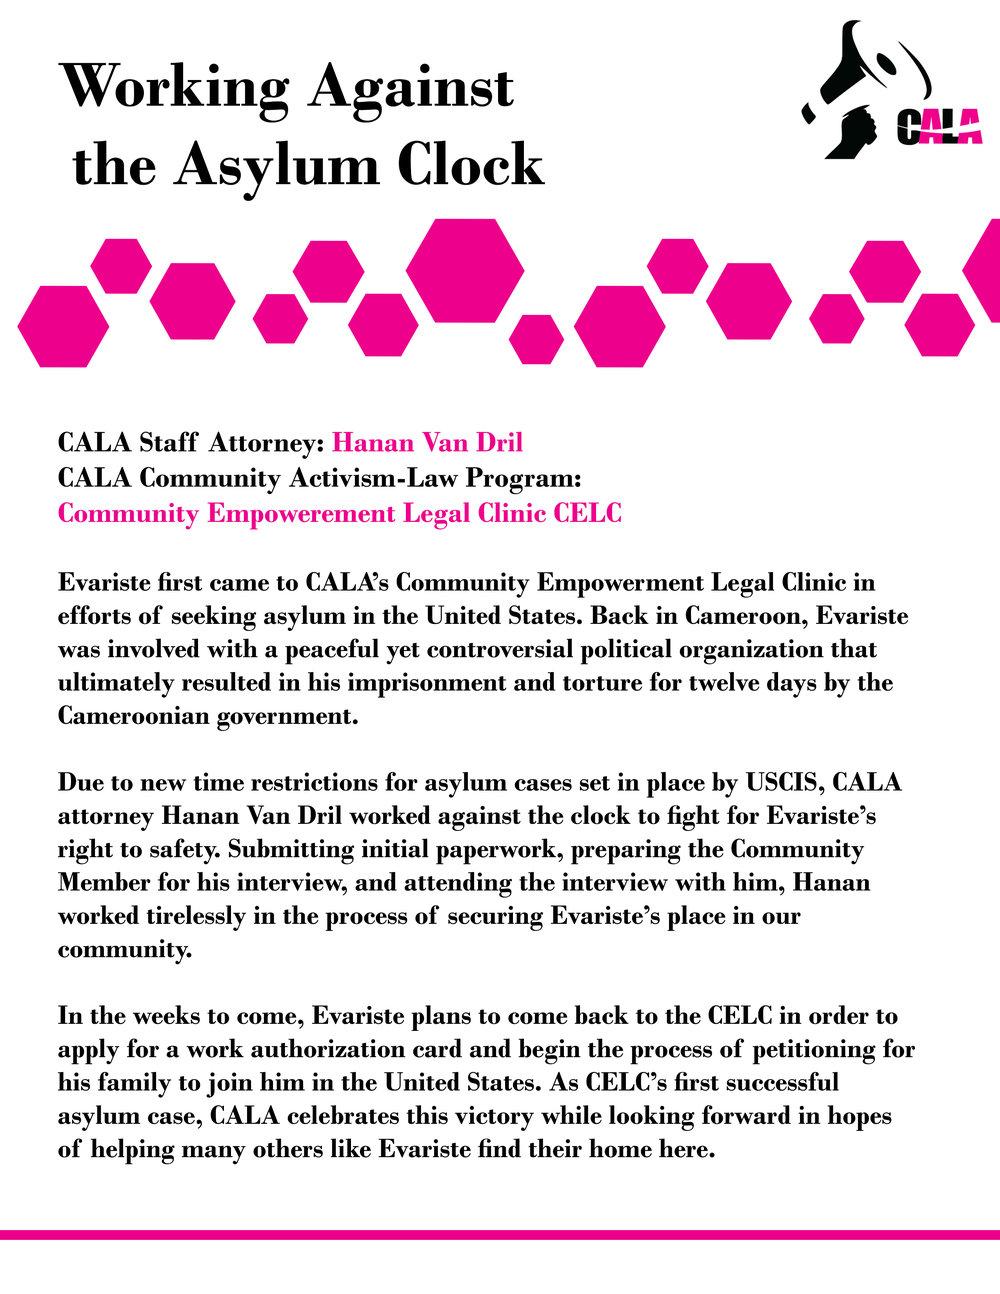 working againts the asylum clock pg 1.jpg